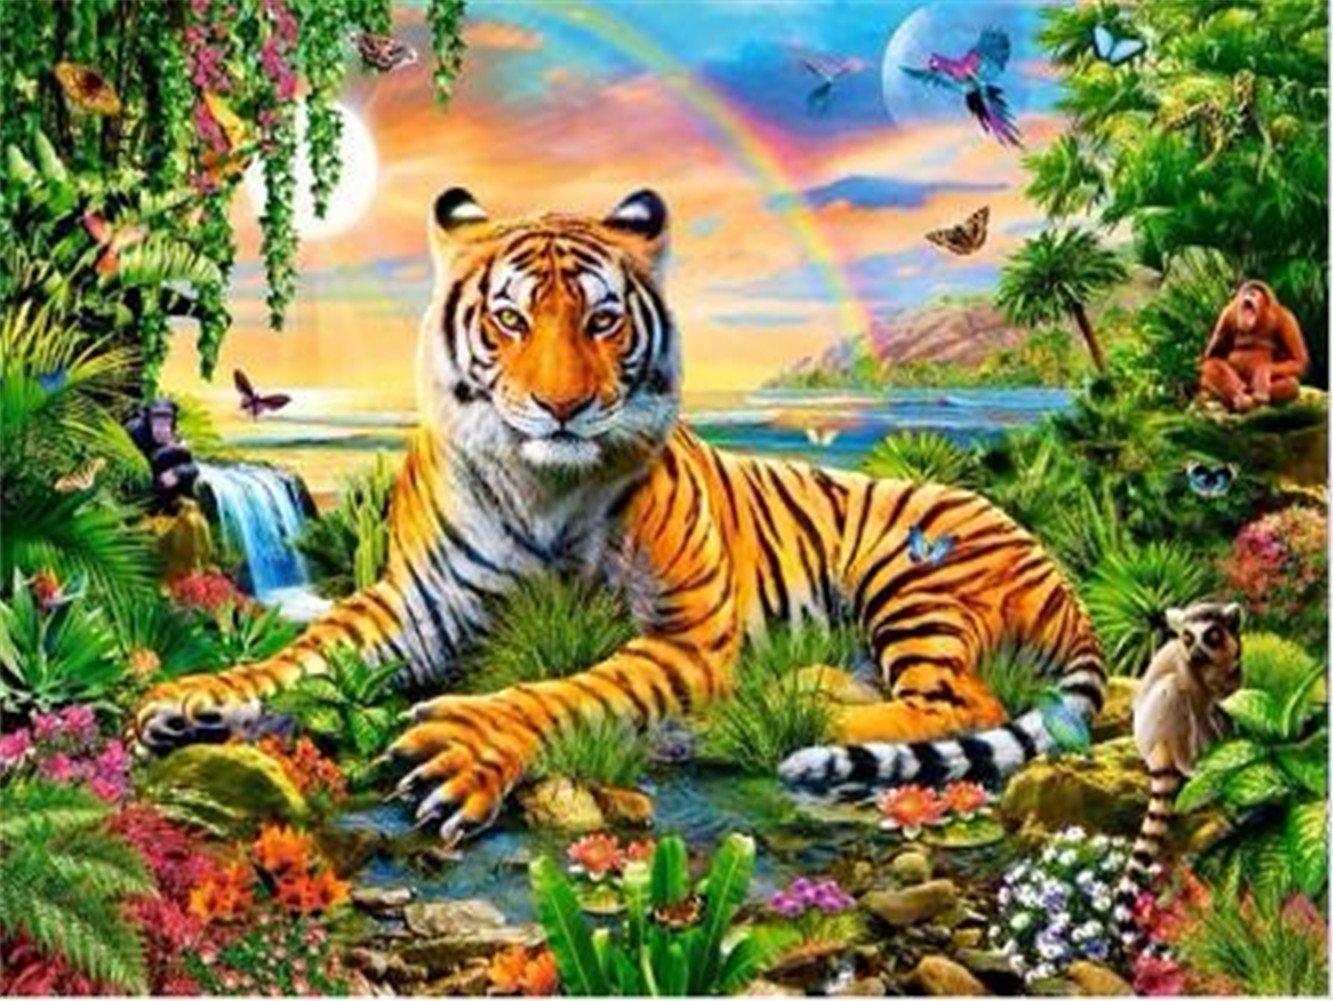 LIPHISFUN 5D Diy Diamond Painting Tiger Forest Rainbow Embroidery Full Square Diamond Cross Stitch Rhinestone Mosaic Painting Decor(30x40cm)